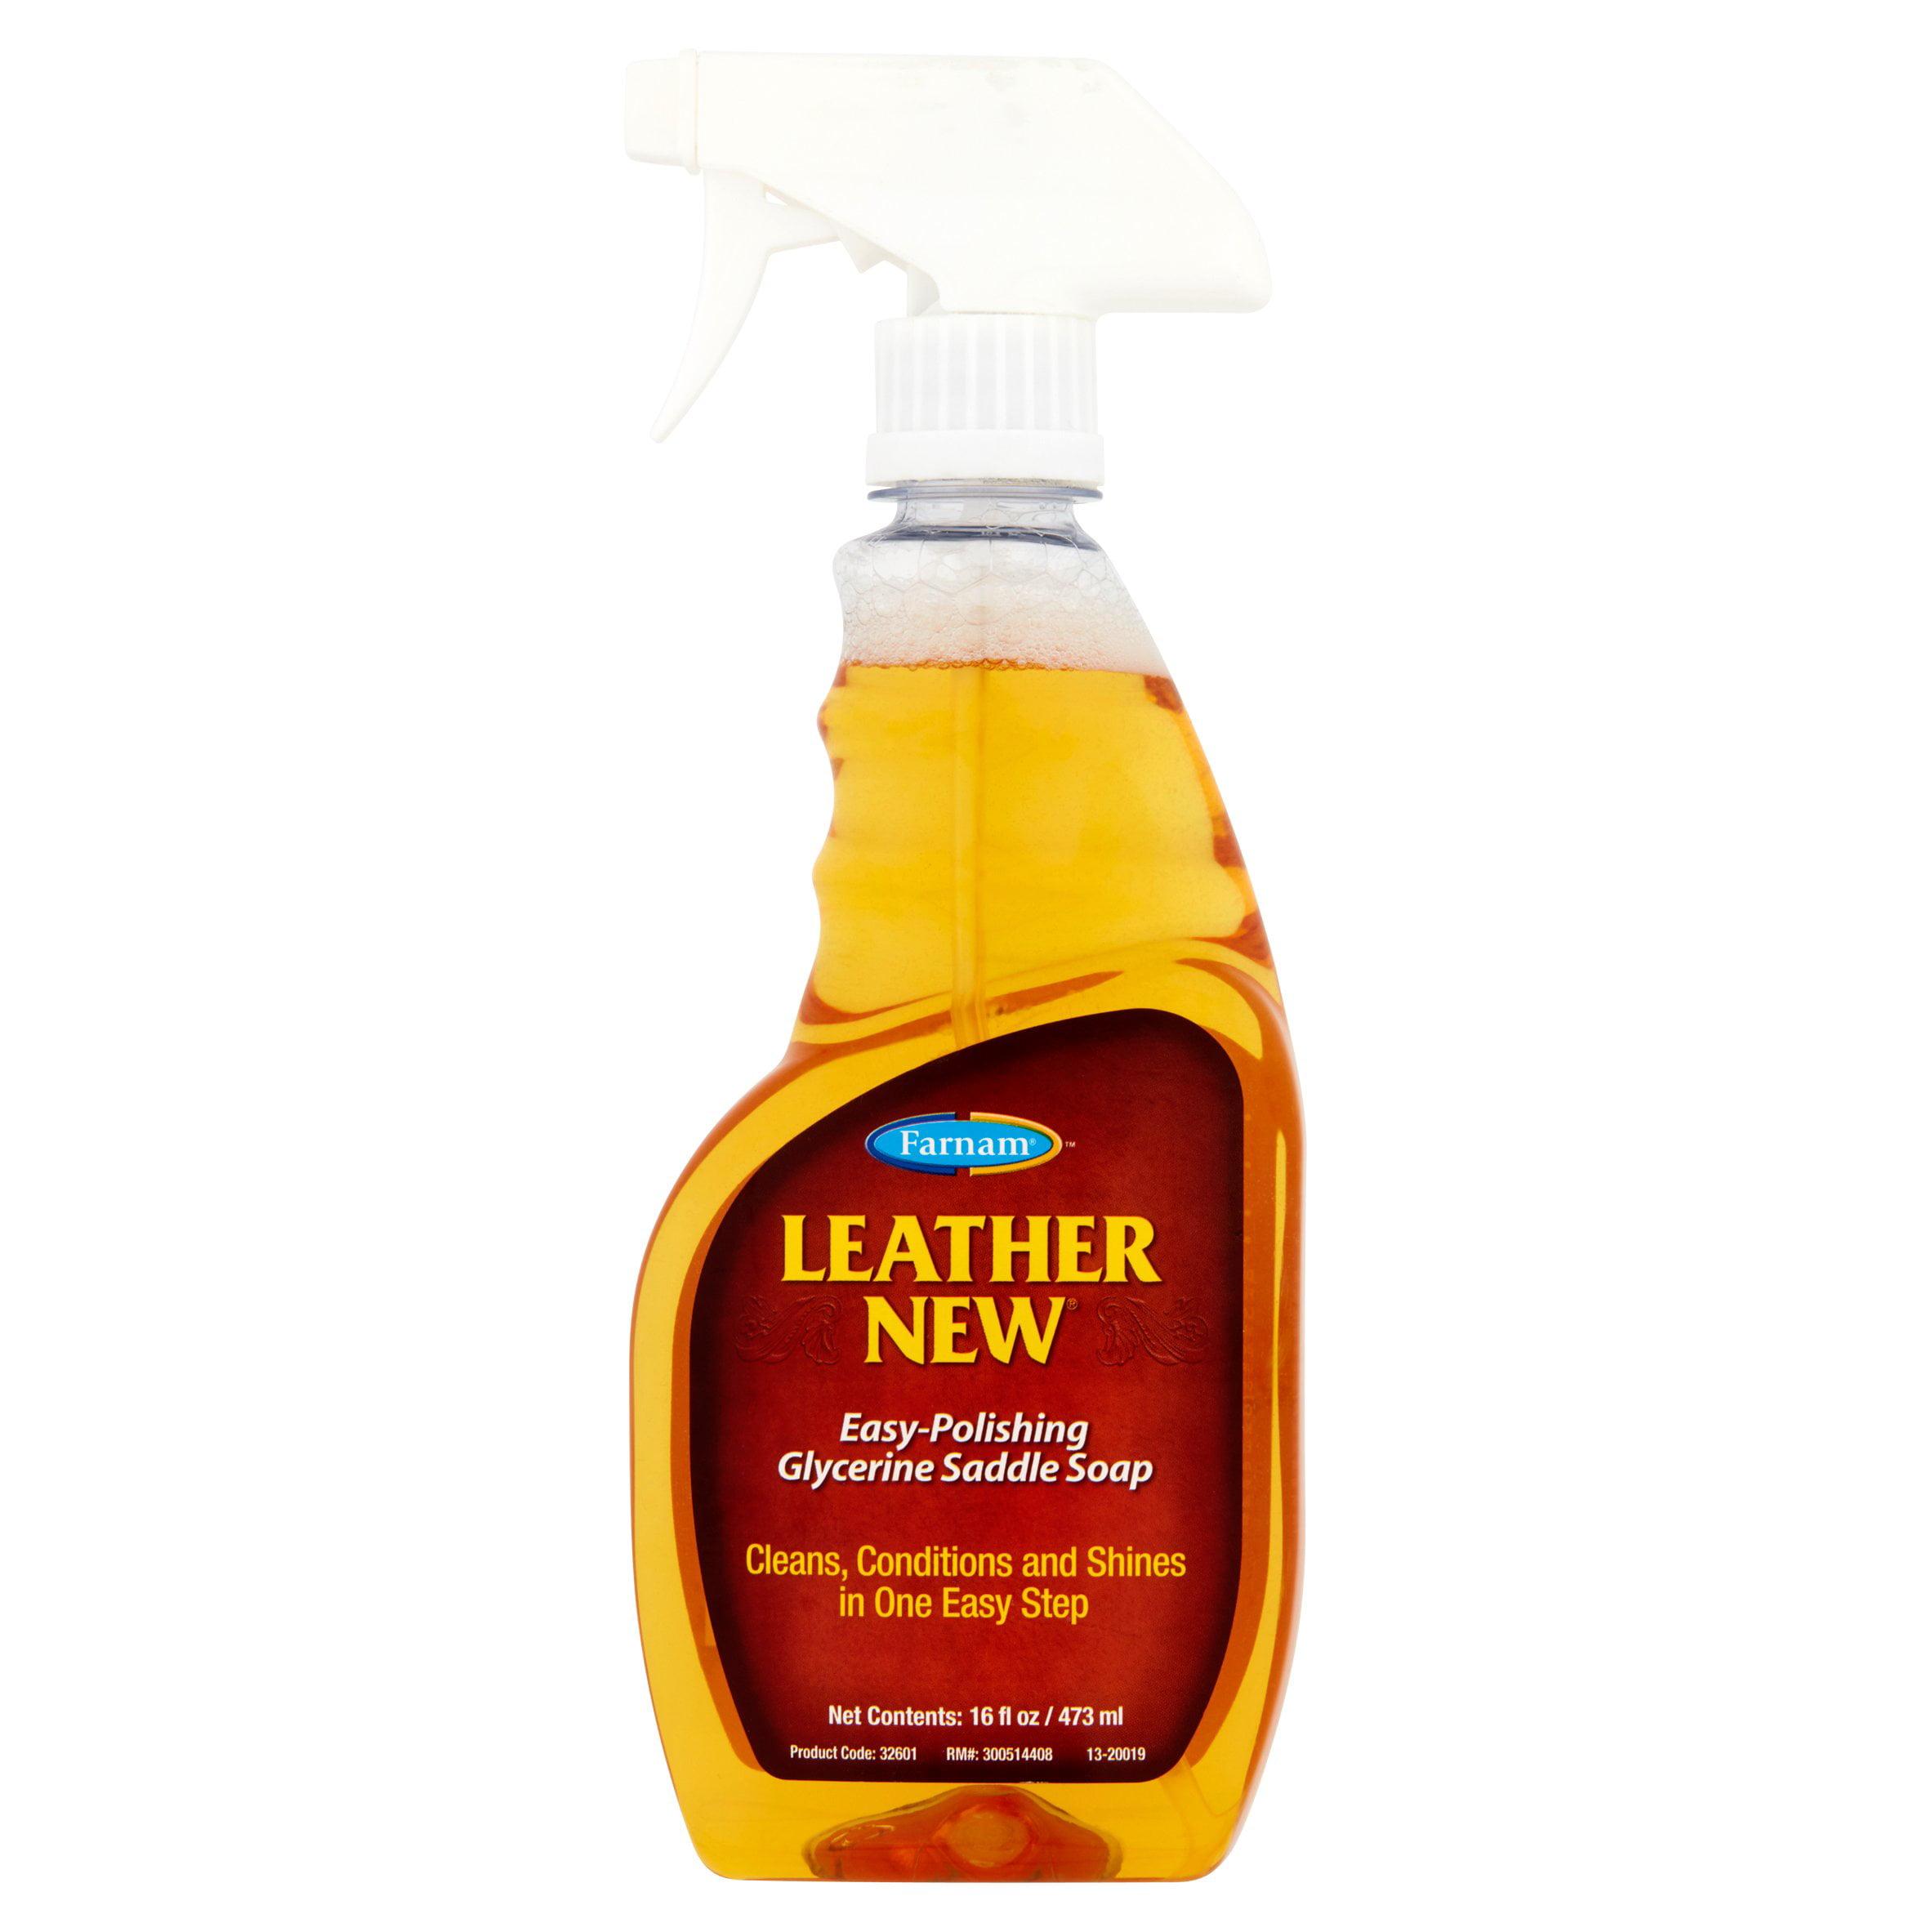 Farnam Leather New Easy-Polishing Glycerine Saddle Soap, 16 fl oz